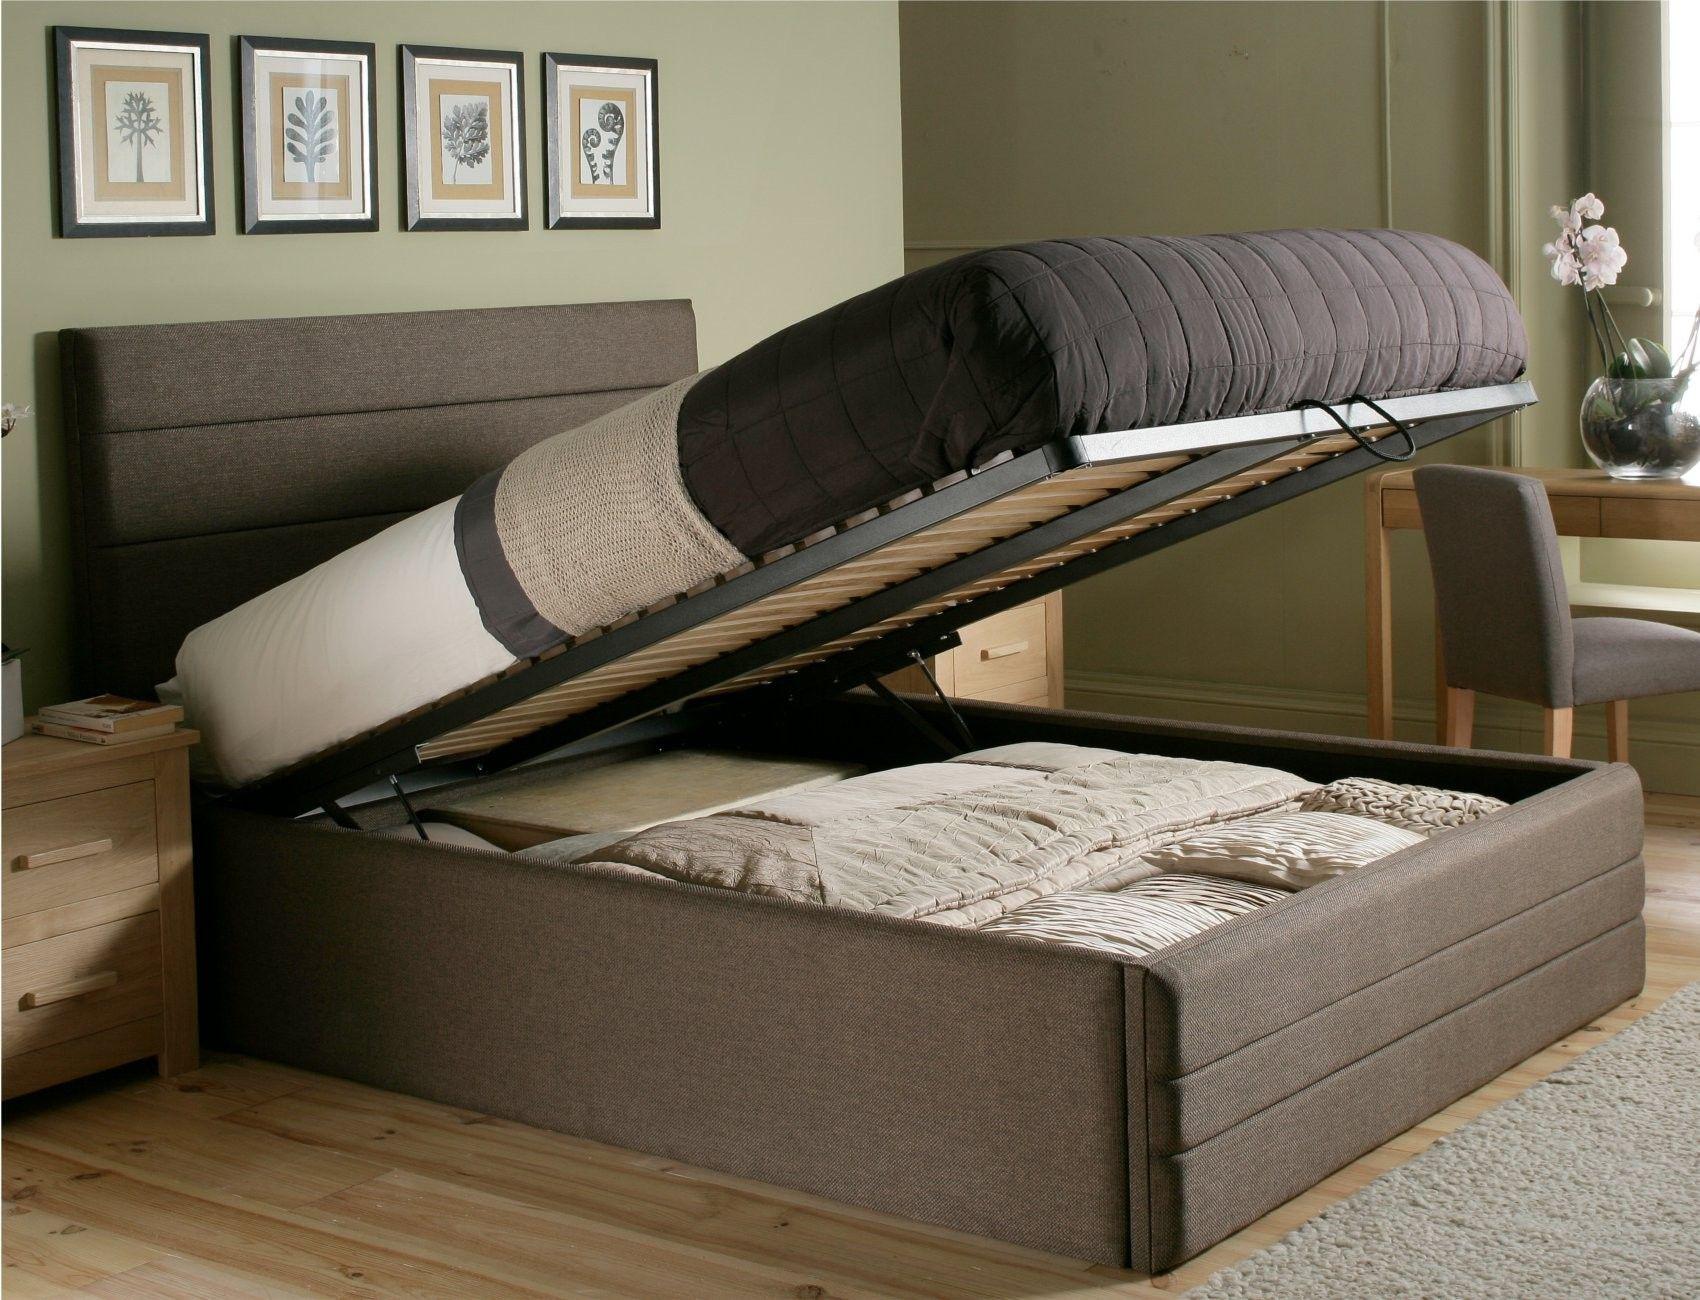 Claridge Upholstered Ottoman Storage Bed £499.00 Ottoman